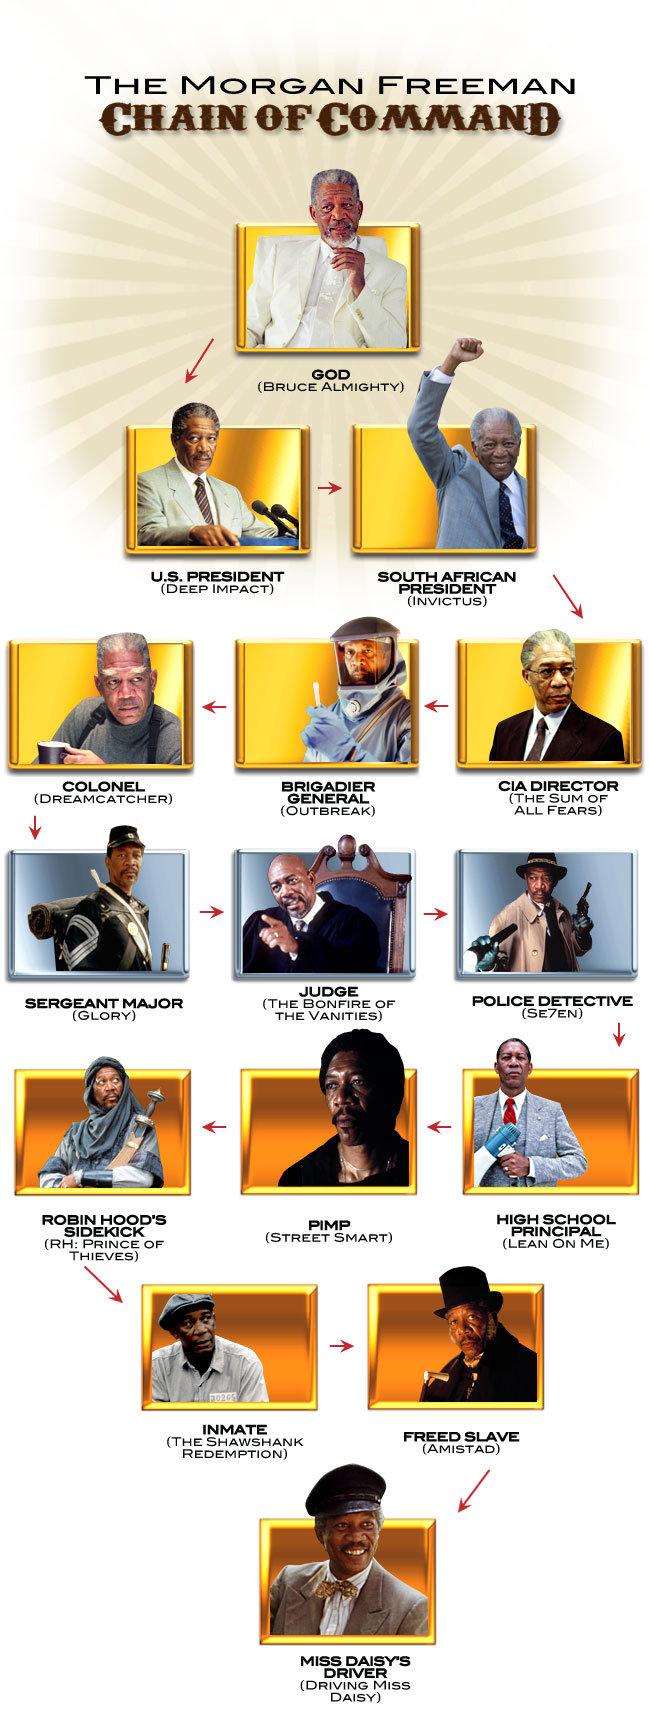 "The Morgan Freeman Chain of Command. Morgan Freeman rag to fame. THE FREEMAN LLB. PRESIDENT AFRICAN in EET' IMPACT} BRIGADIER cm :' I"" Dfl GENERAL {THE SLIM OF"